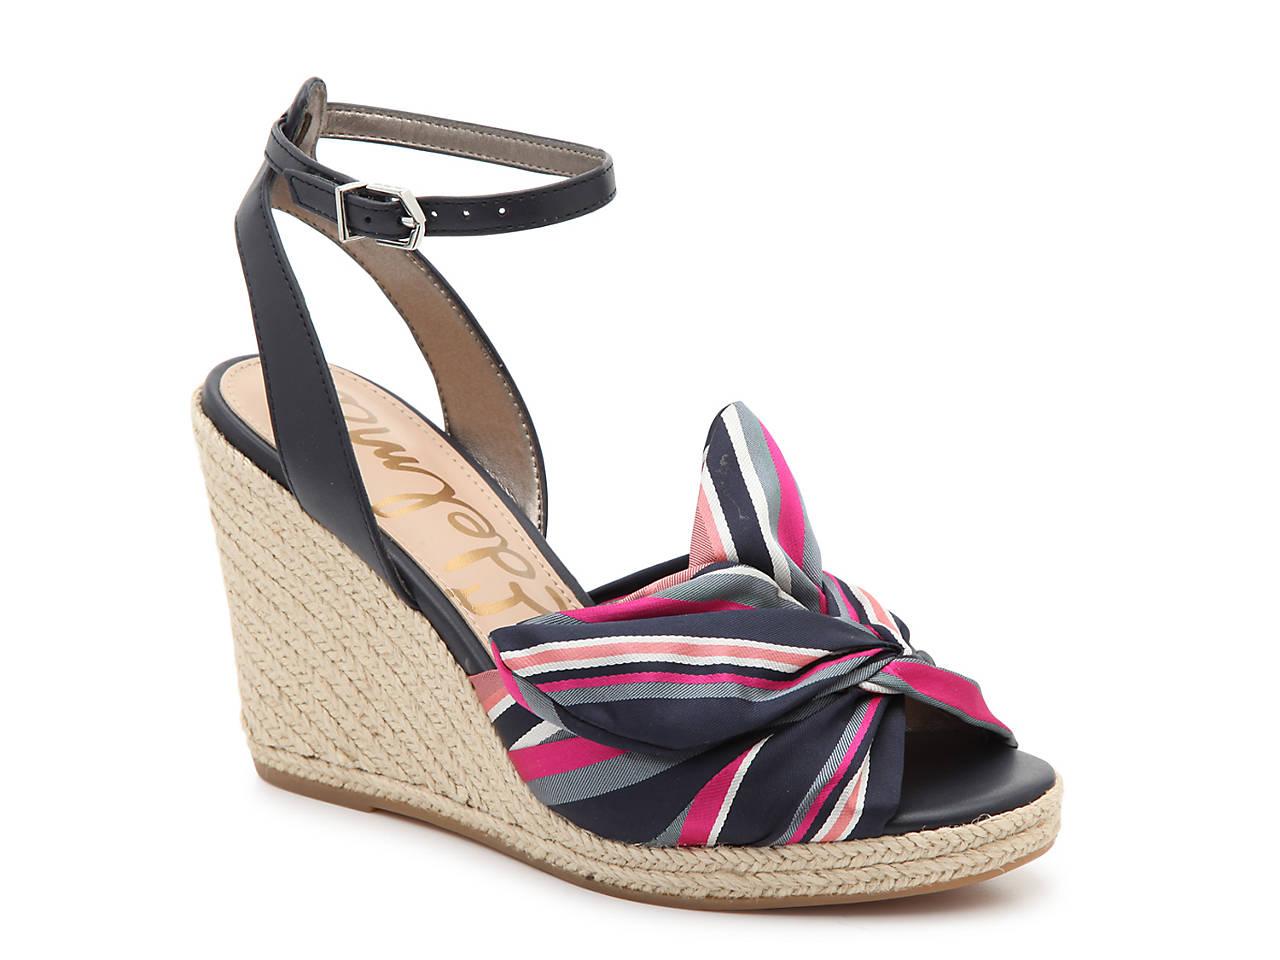 8ea5255625f2 Sam Edelman Aubrey Wedge Sandal Women s Shoes